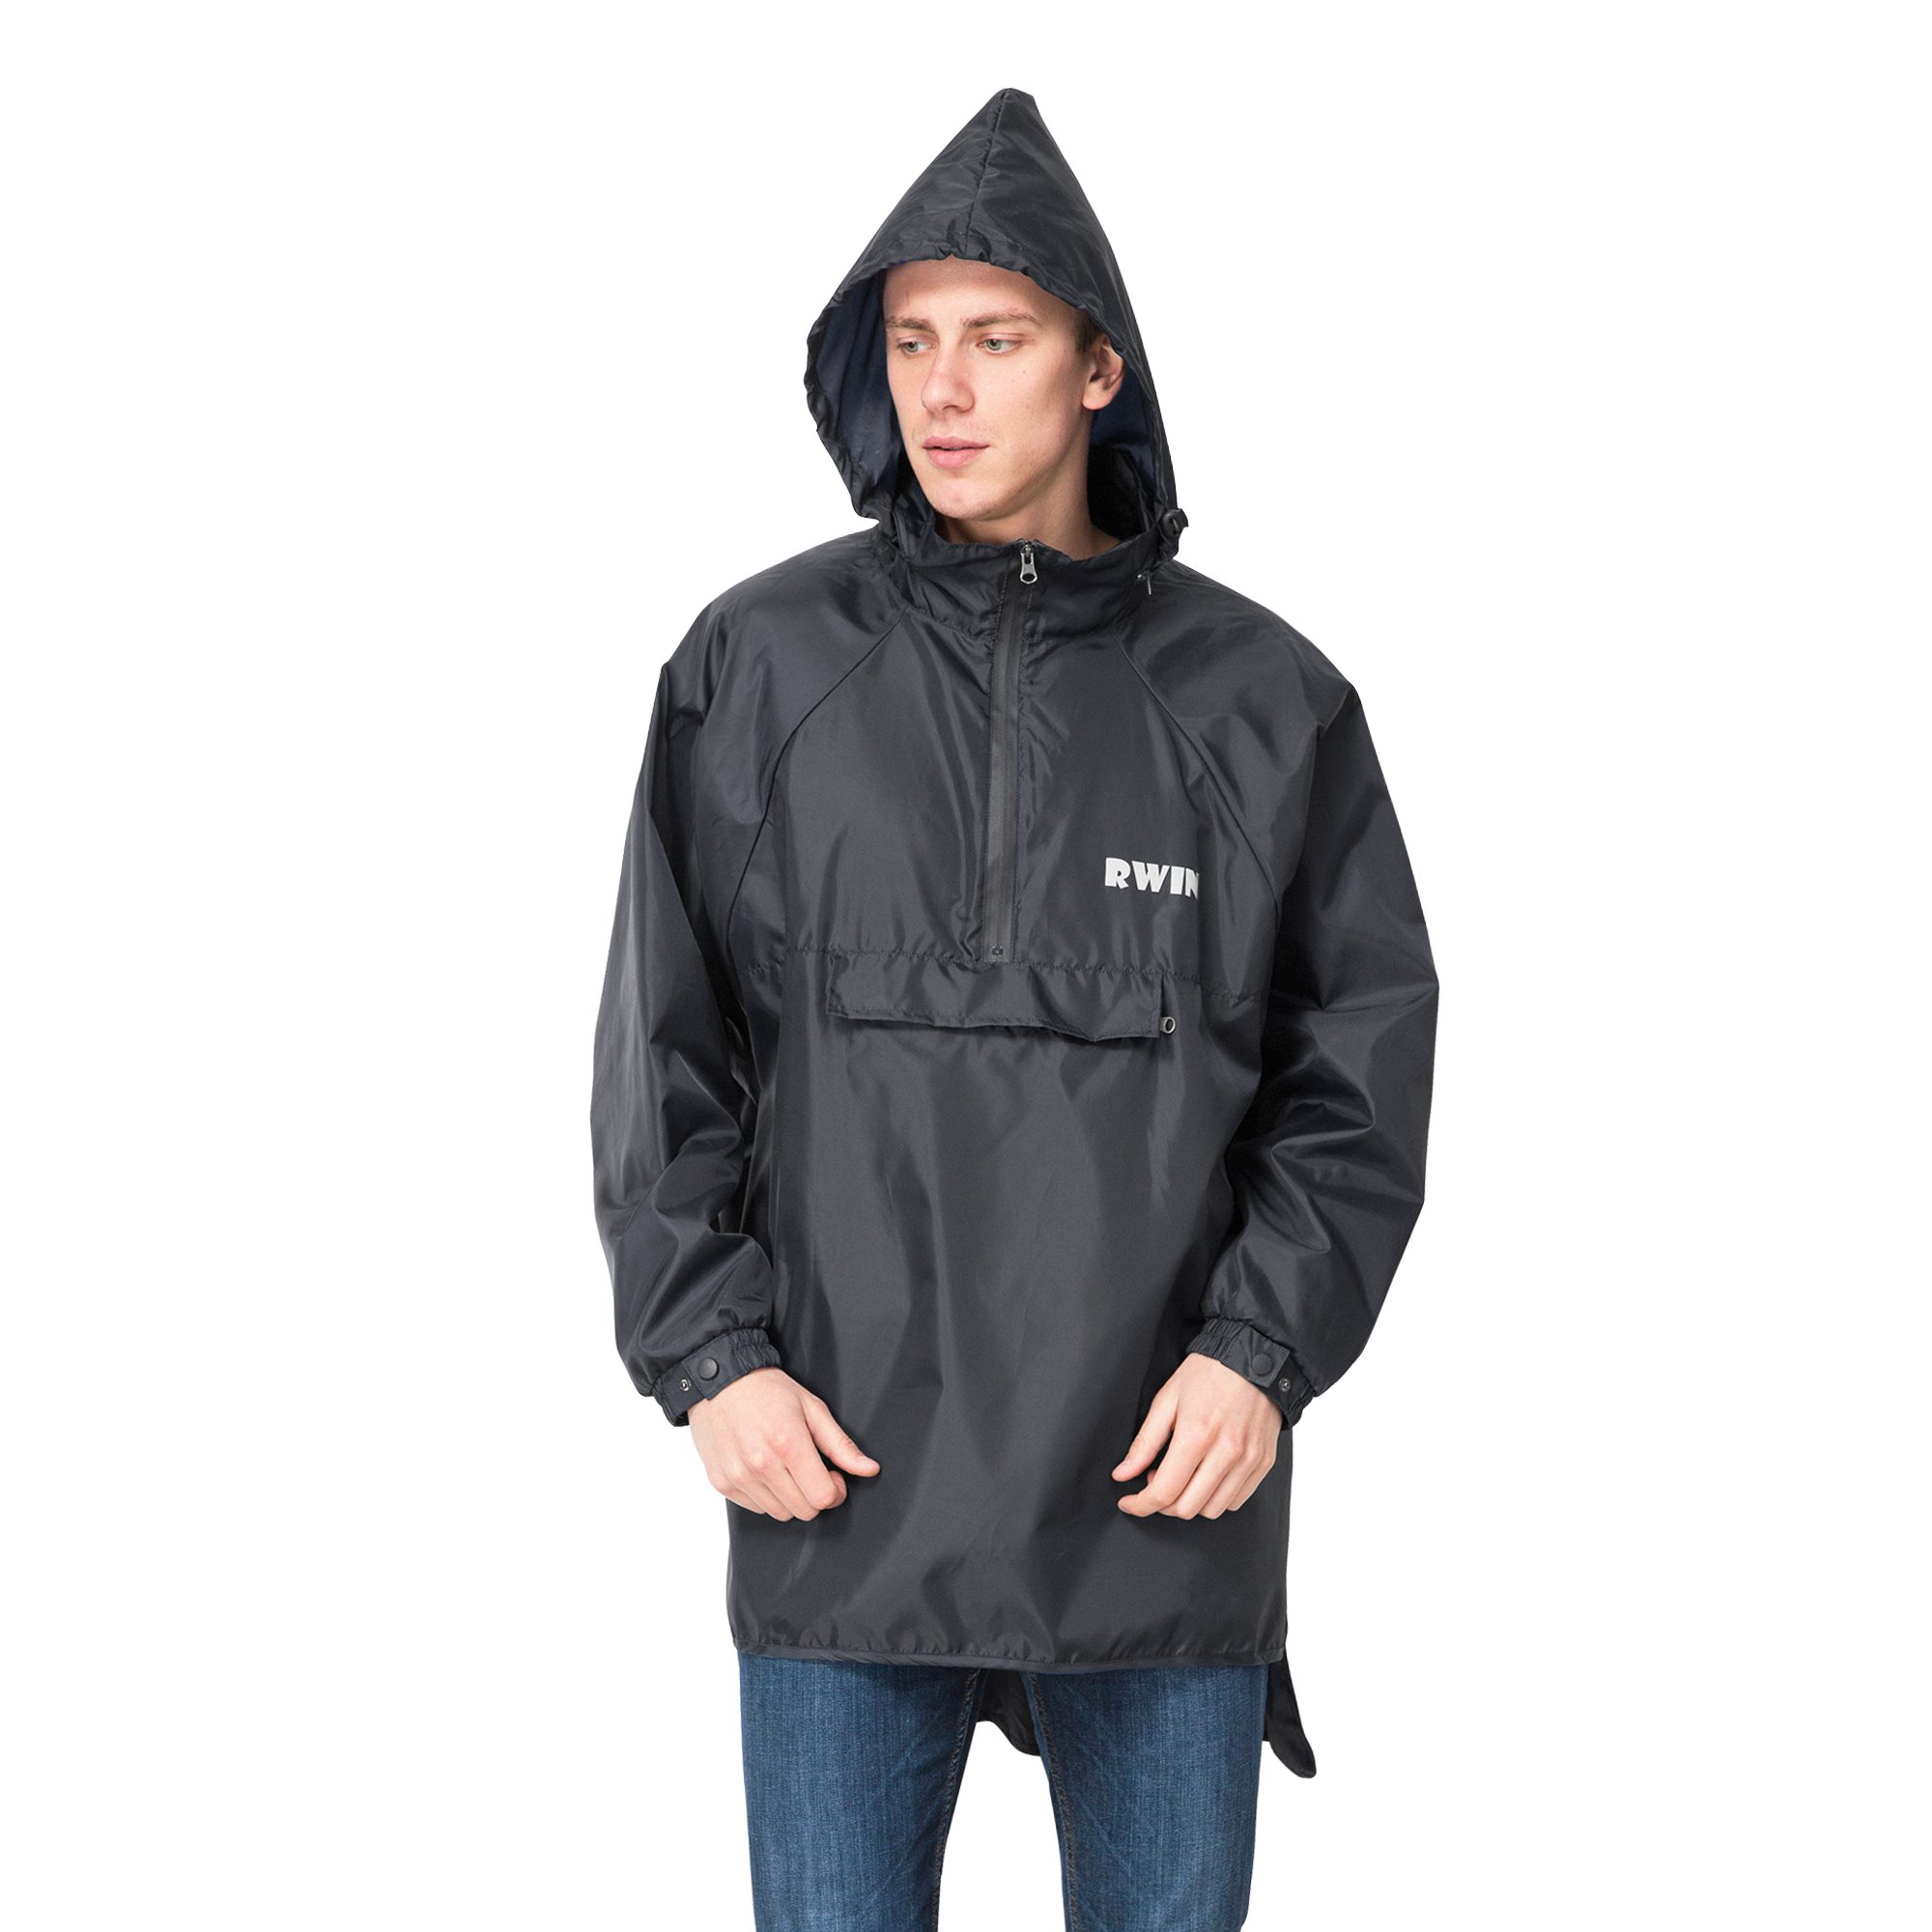 ZDHGLOBAL Men's Women's Resolve 2 Lightweight Long Rain Jacket-Black-S/M